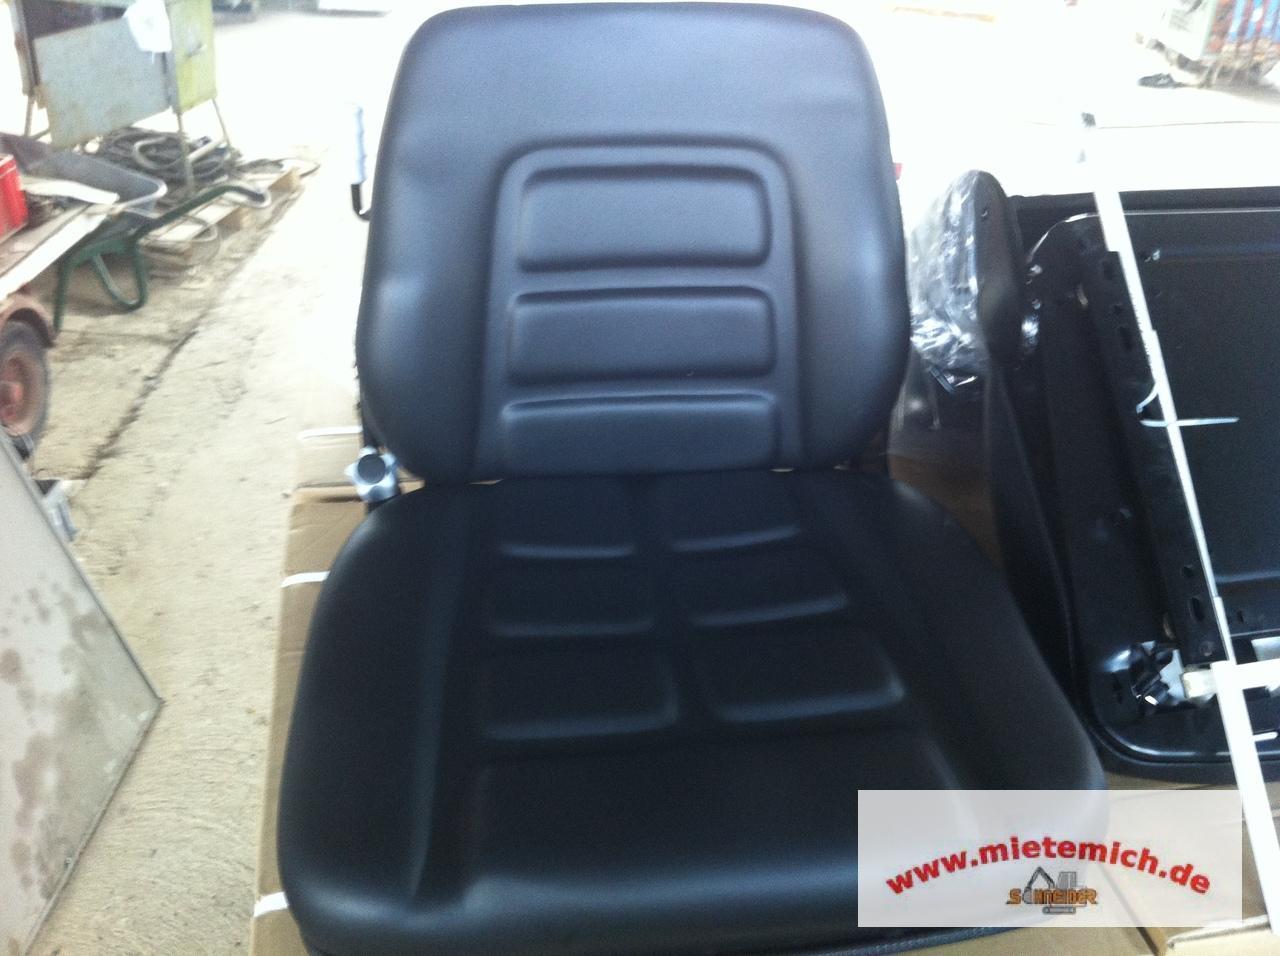 baumaschinensitze traktorensitze kransitze. Black Bedroom Furniture Sets. Home Design Ideas